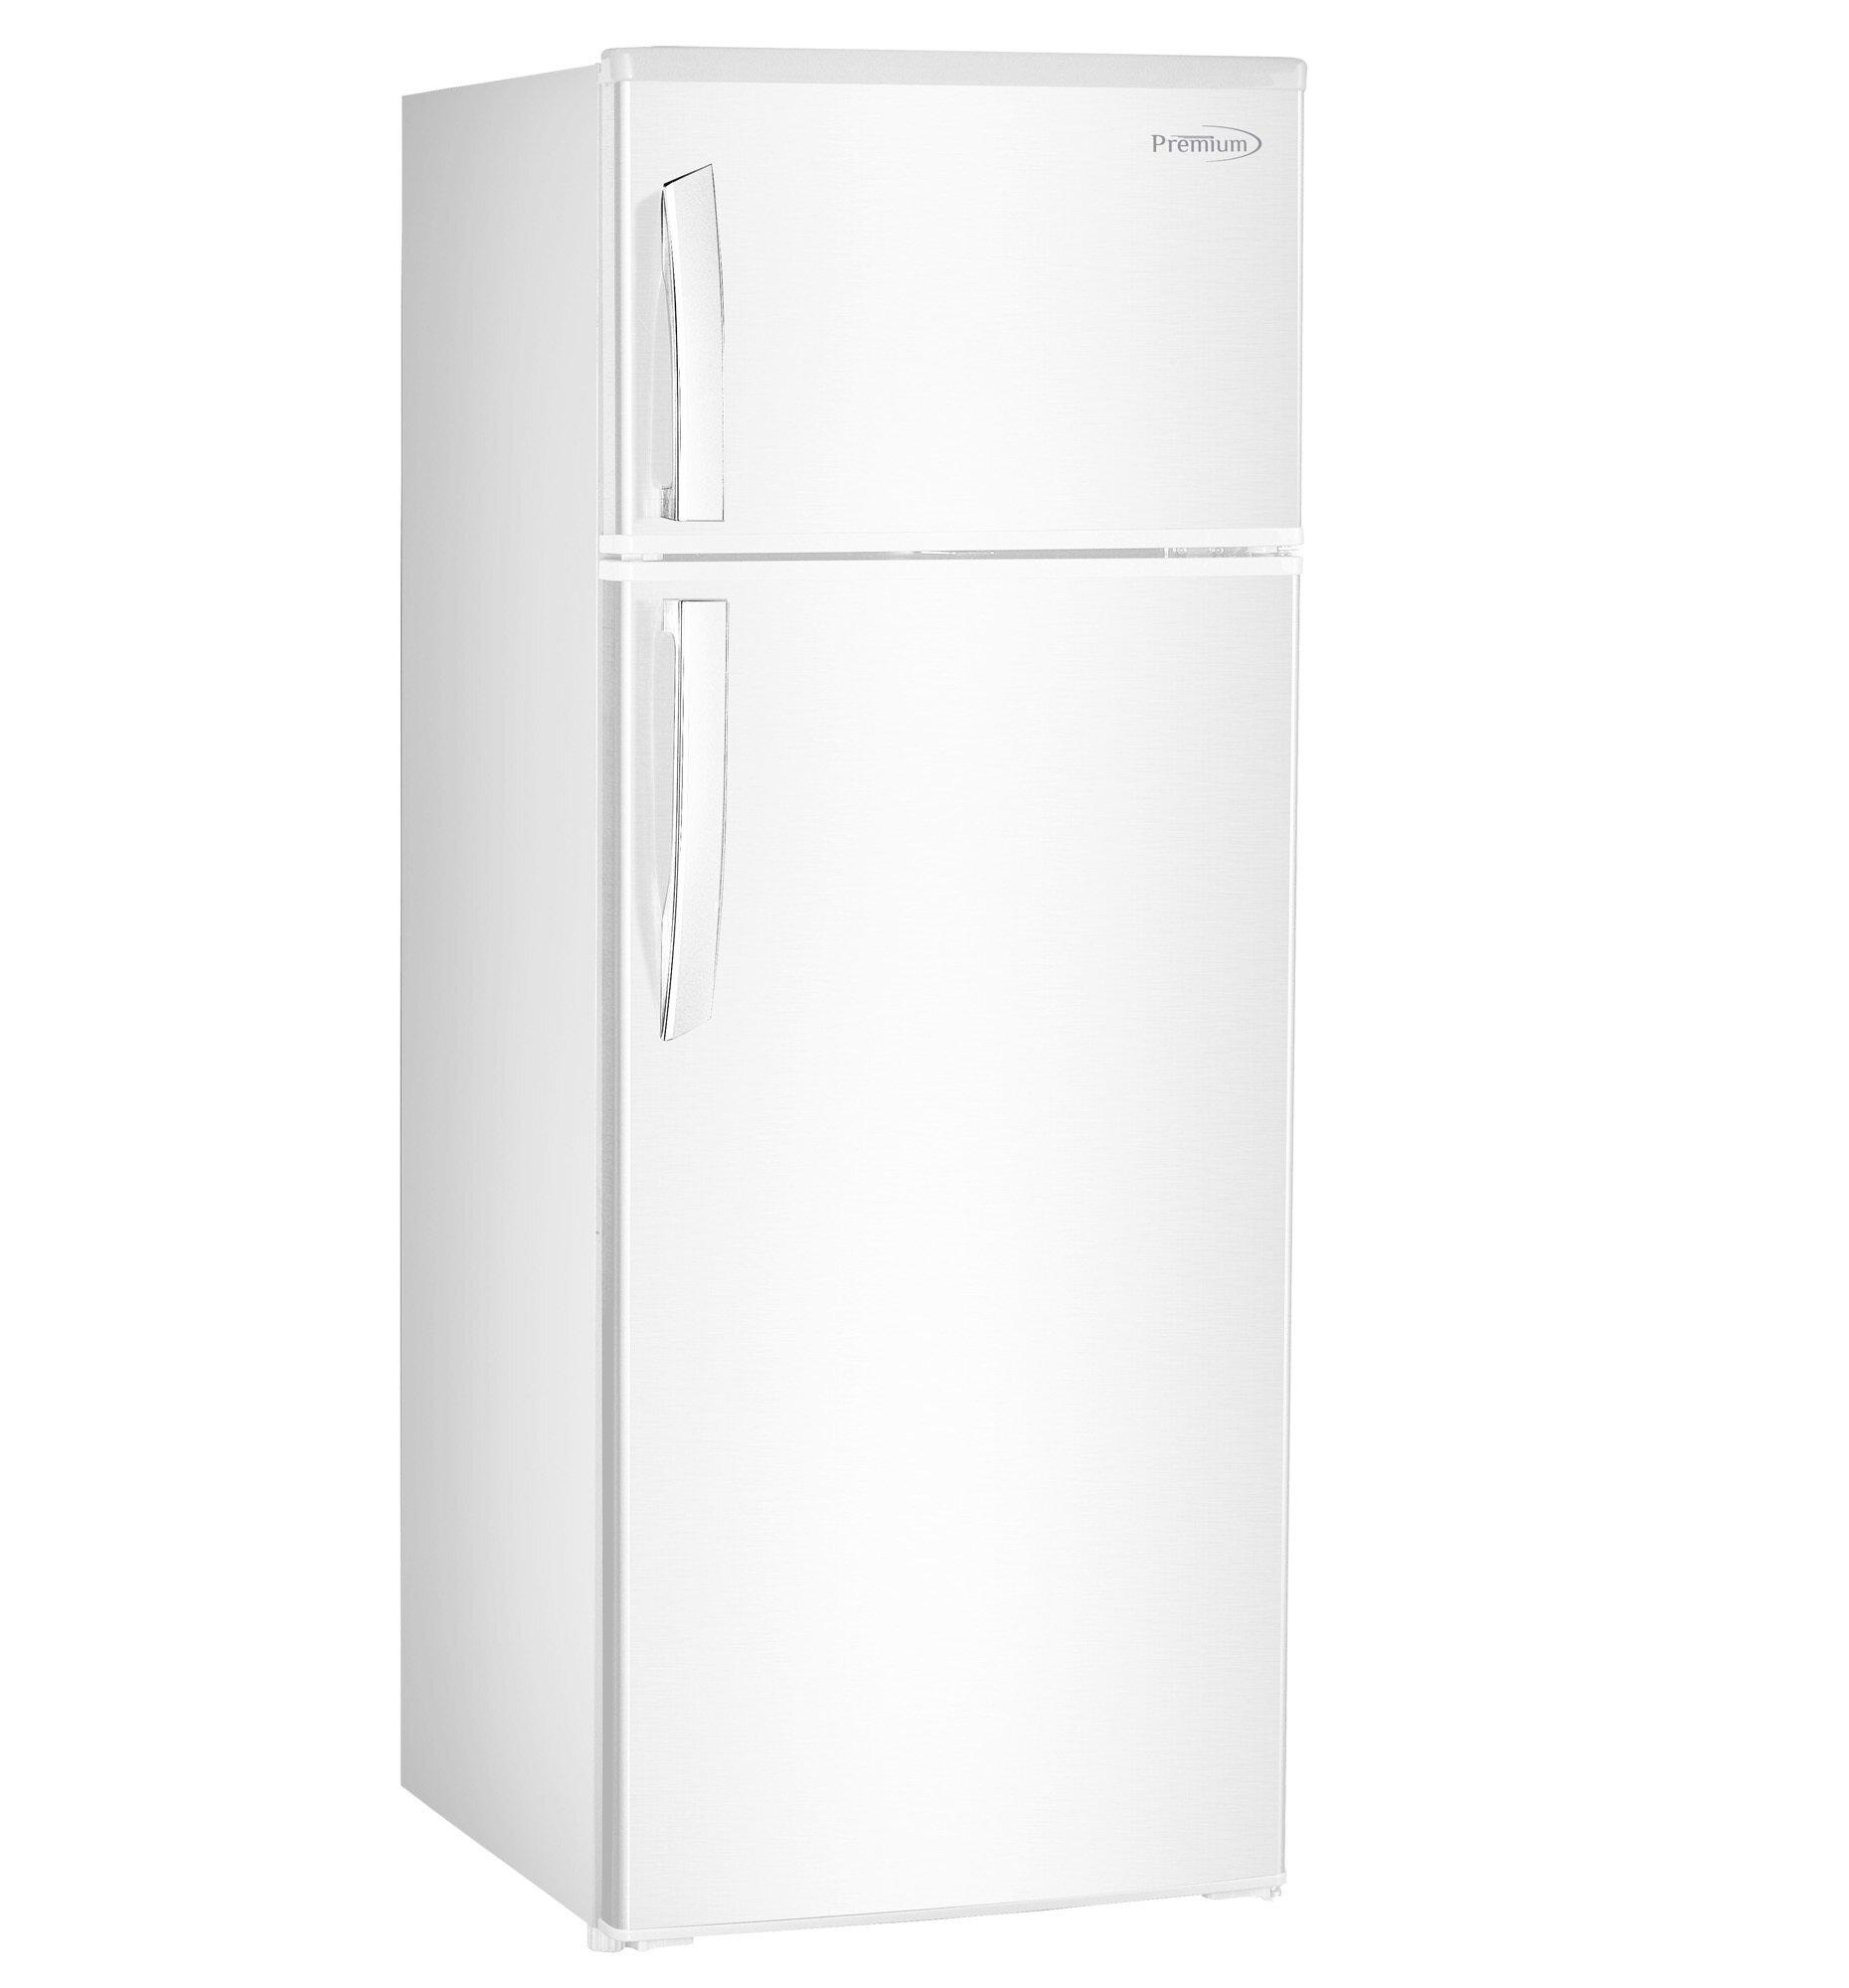 Premium 15 Top Freezer 7 4 Cu Ft Energy Star Refrigerator Reviews Wayfair